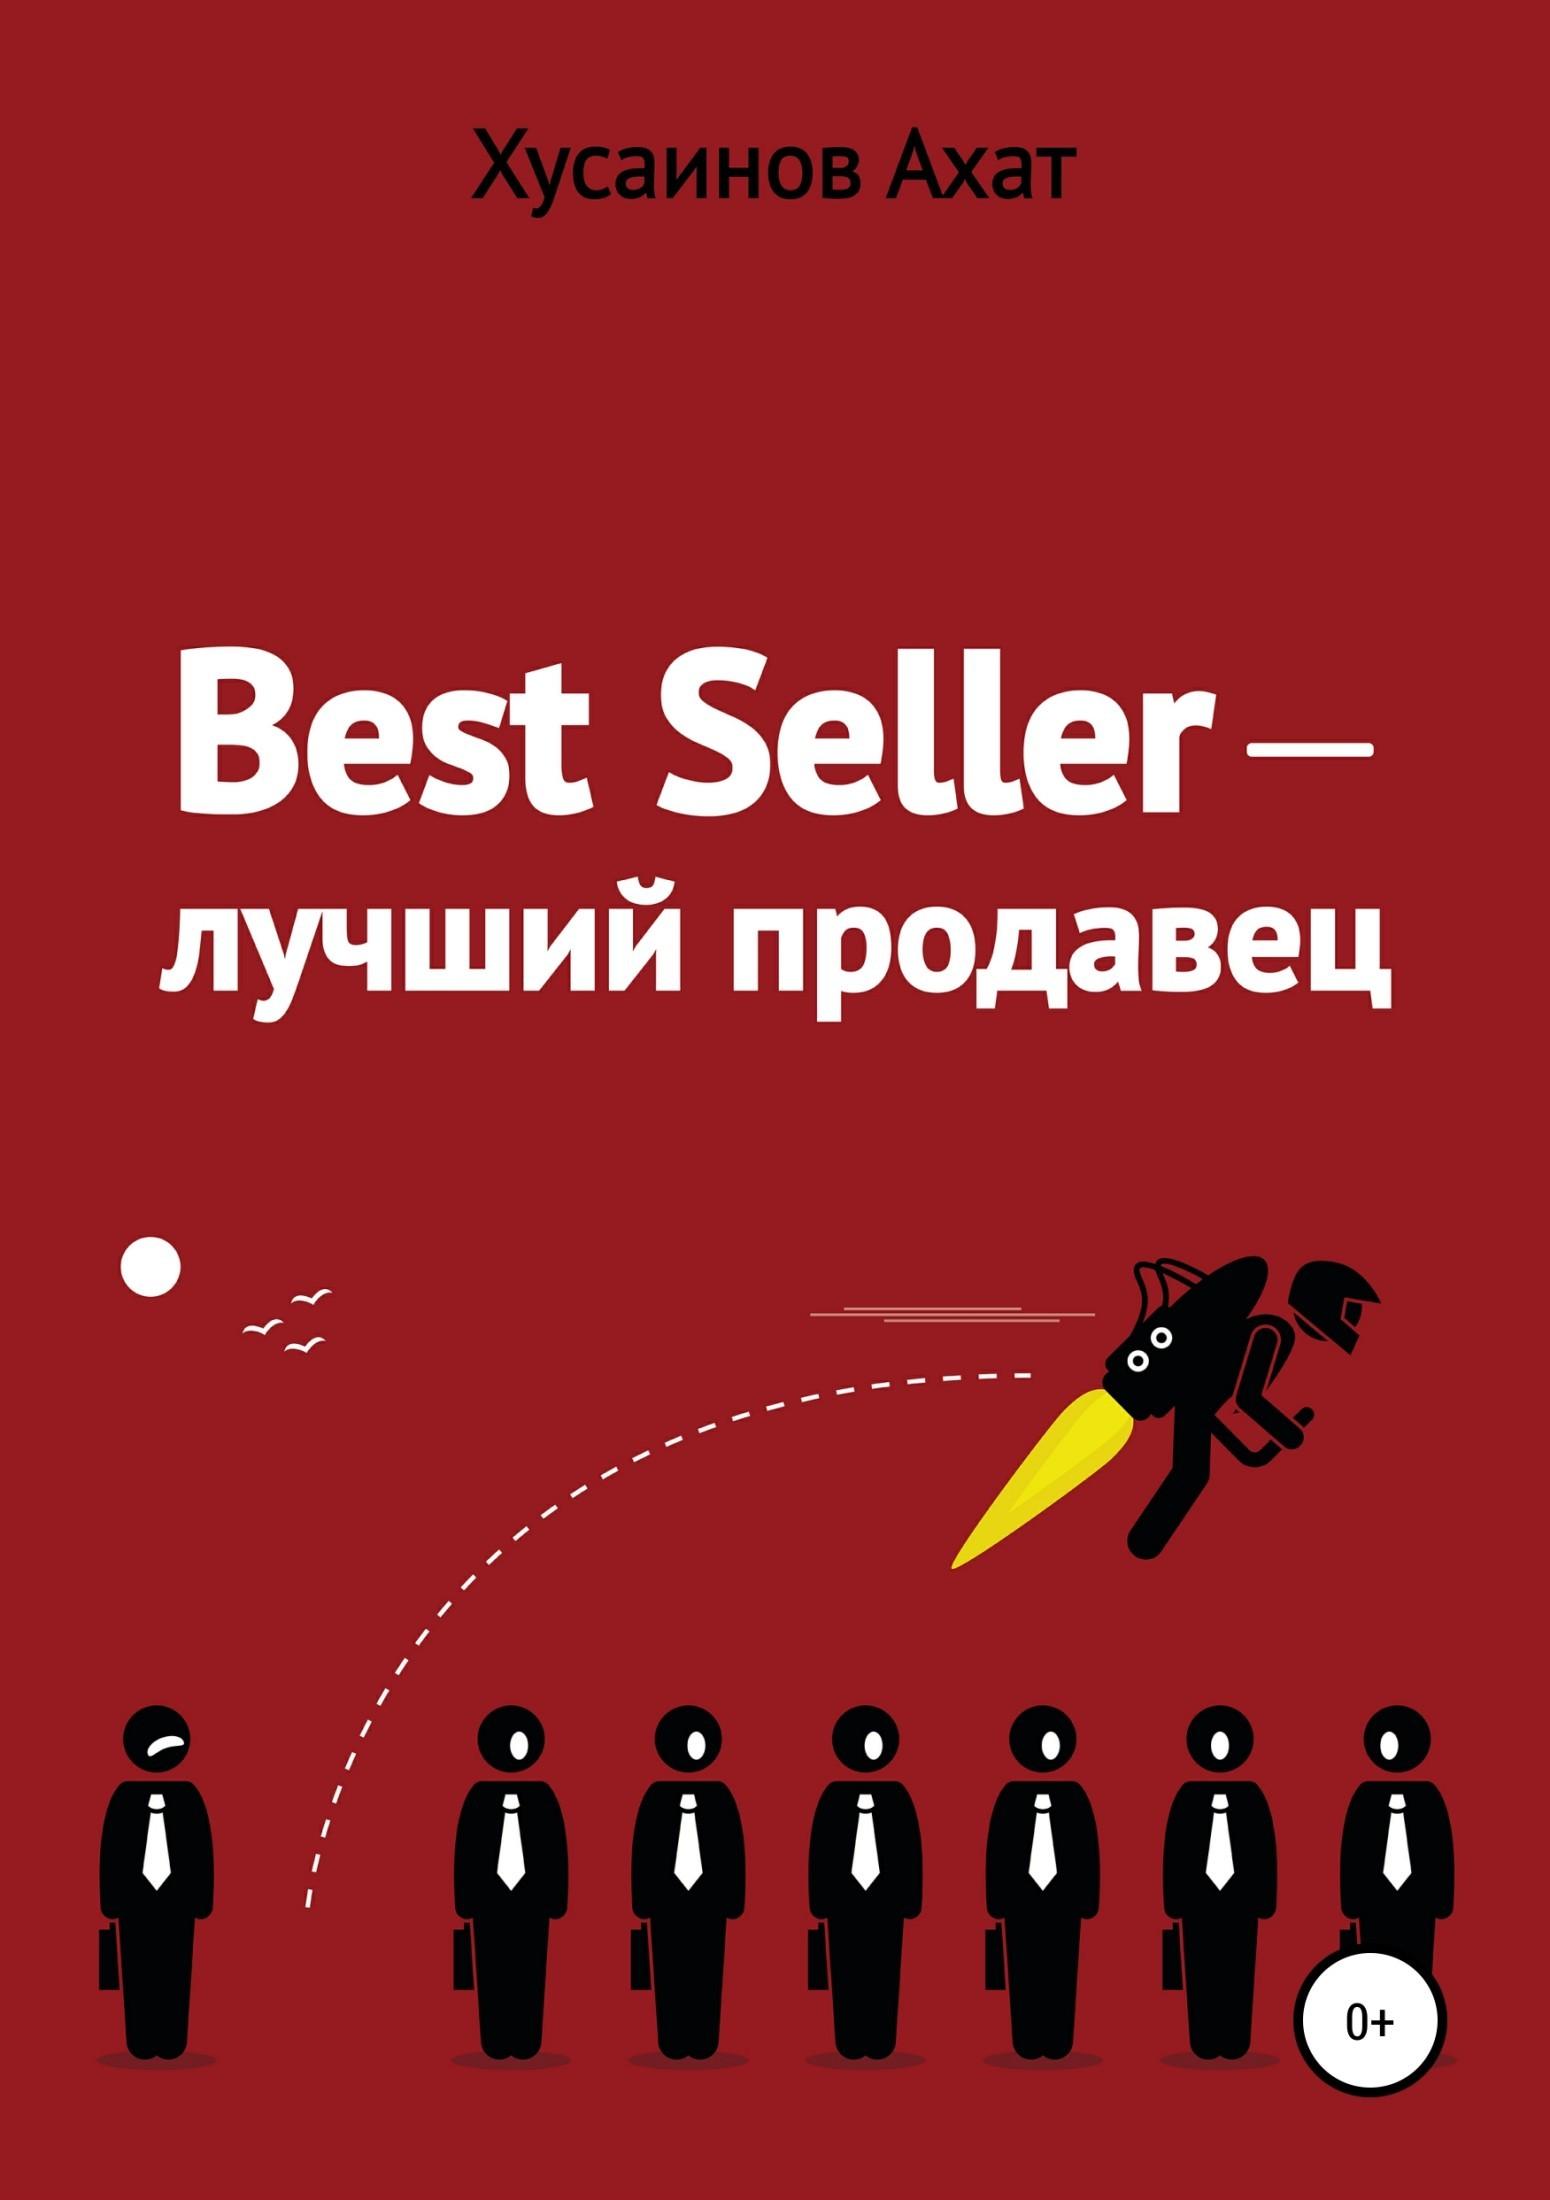 Обложка книги. Автор - Ахат Хусаинов